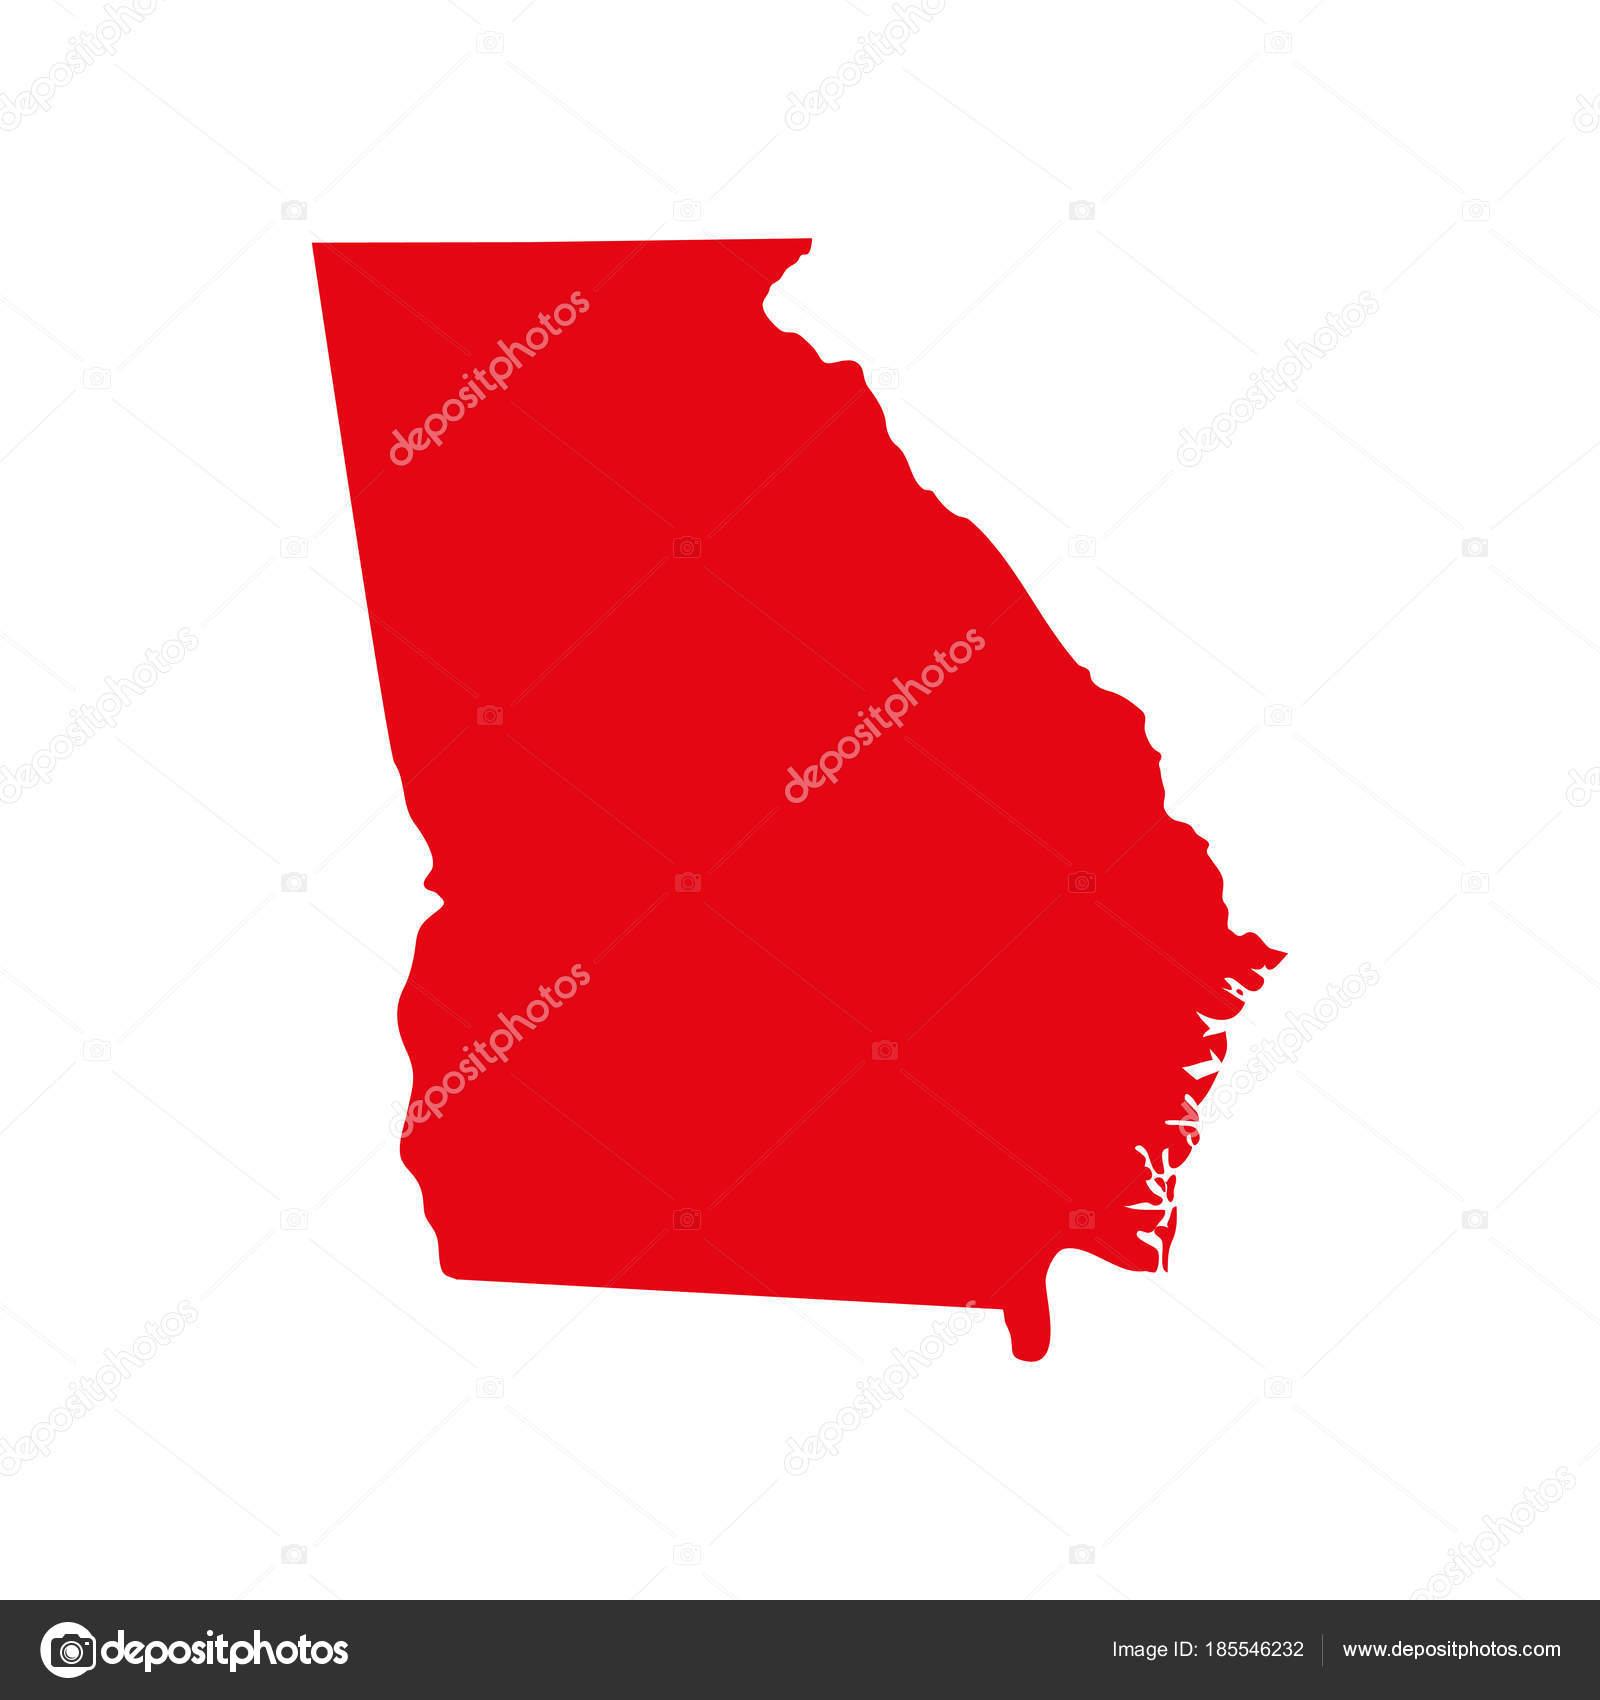 Us Map Of Georgia.Map Of The U S State Of Georgia Stock Vector C Shmonika 185546232